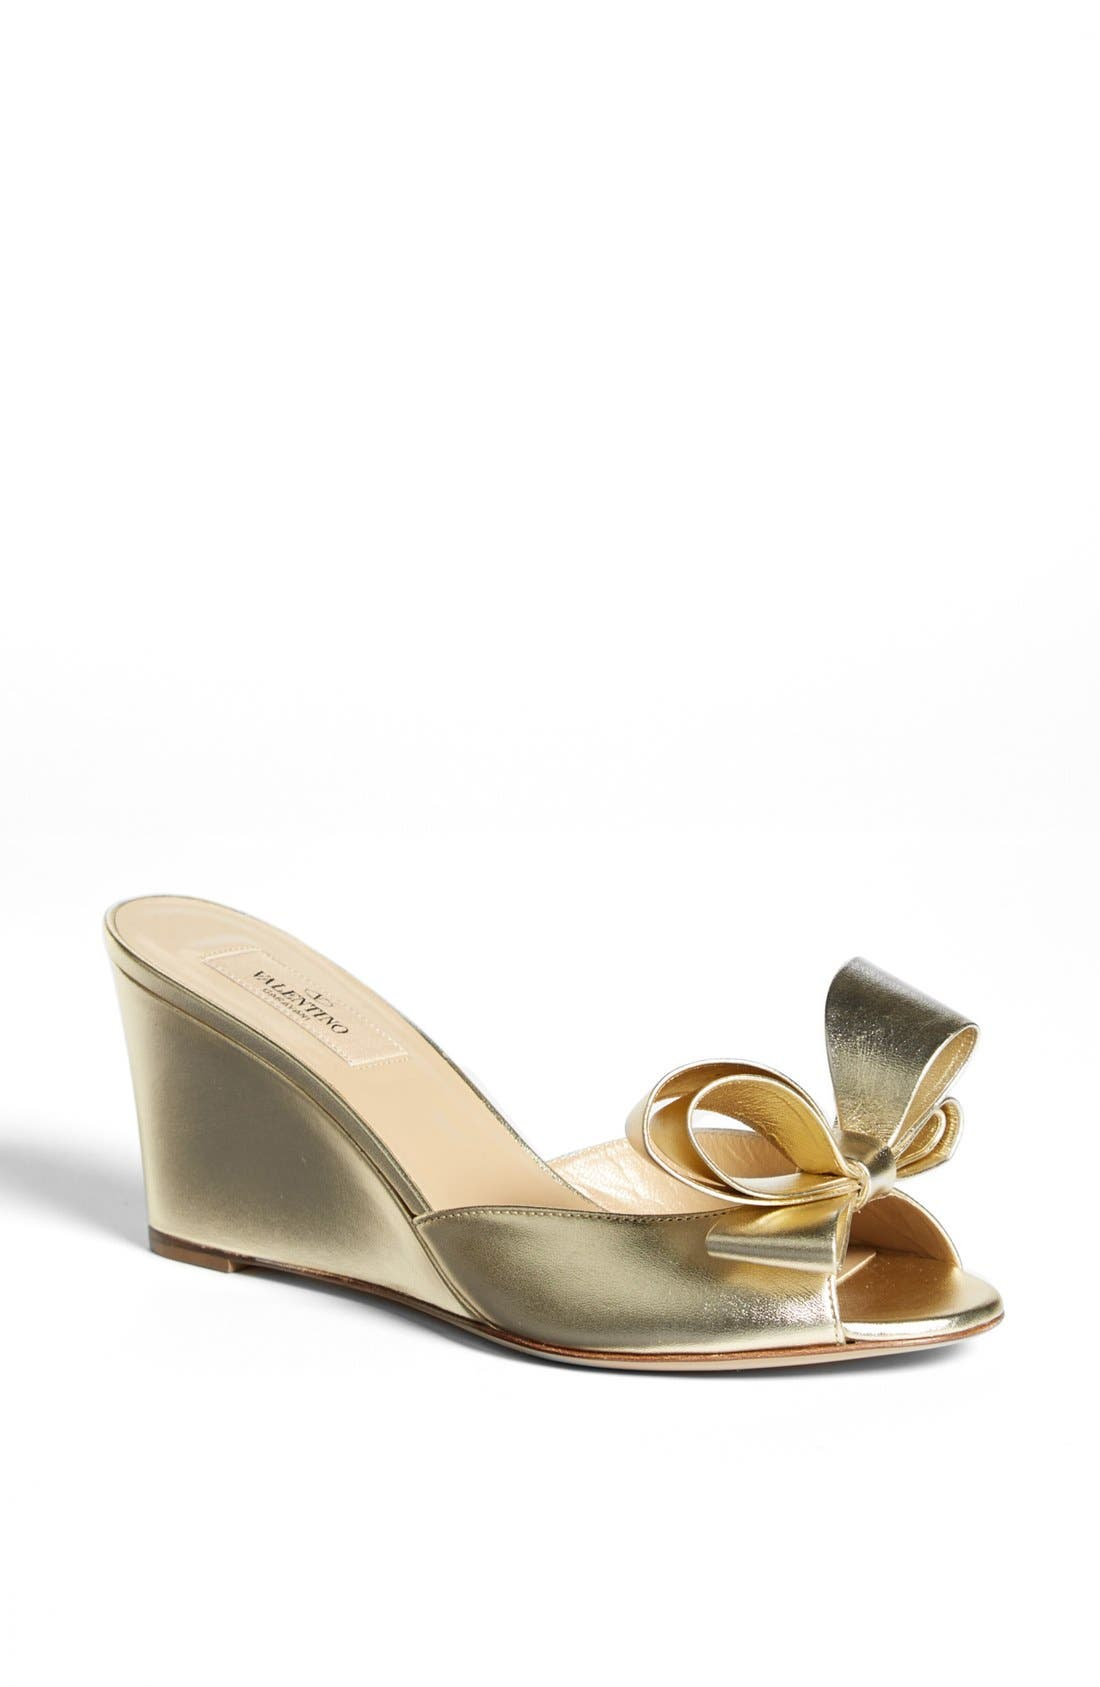 Alternate Image 1 Selected - VALENTINO GARAVANI Bow Wedge Sandal